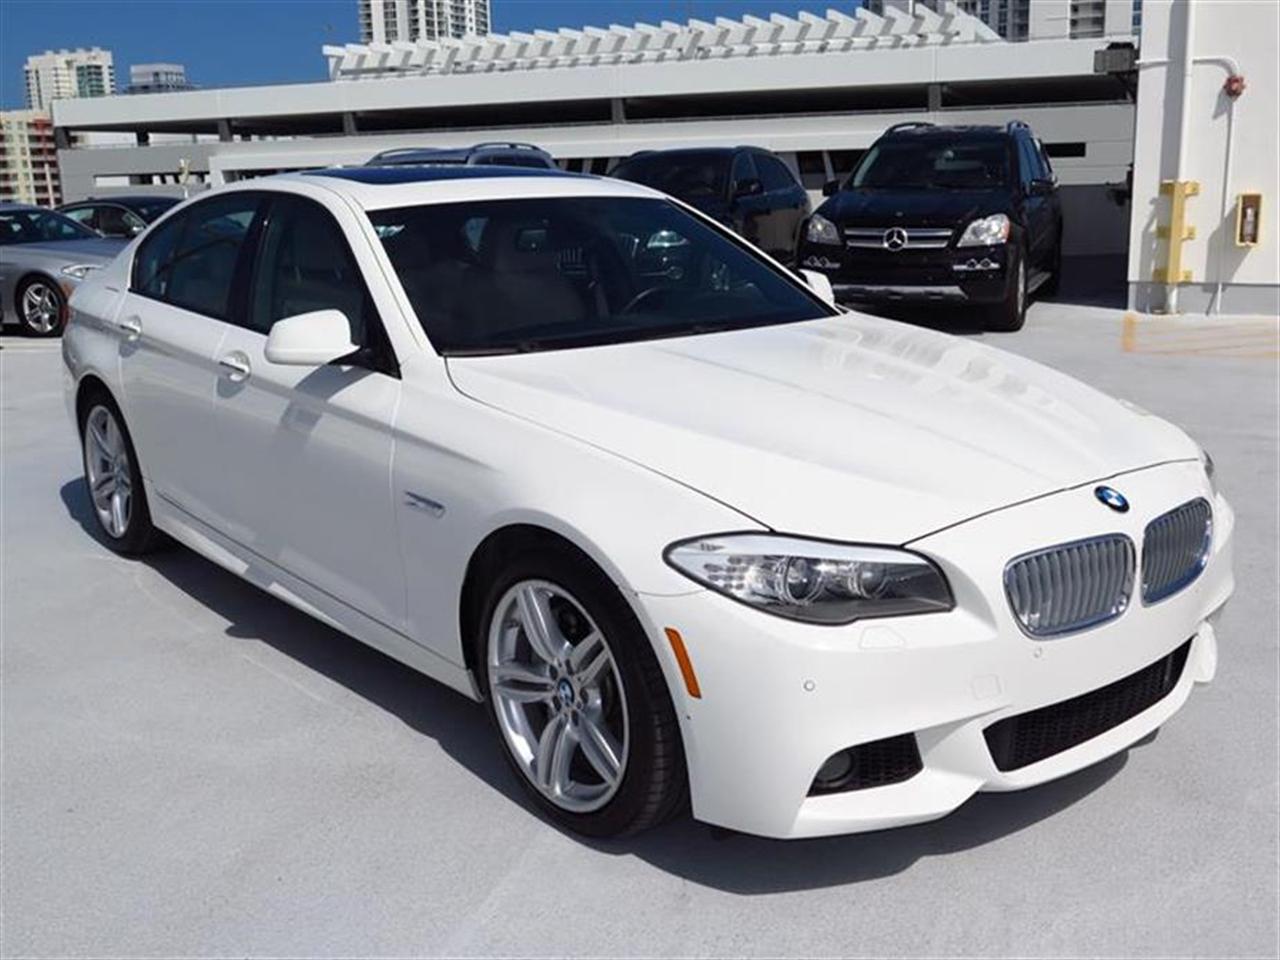 2012 BMW 5 SERIES 4dr Sdn 550i RWD 33951 miles 18-way power-adjustable multi-contour front bucket